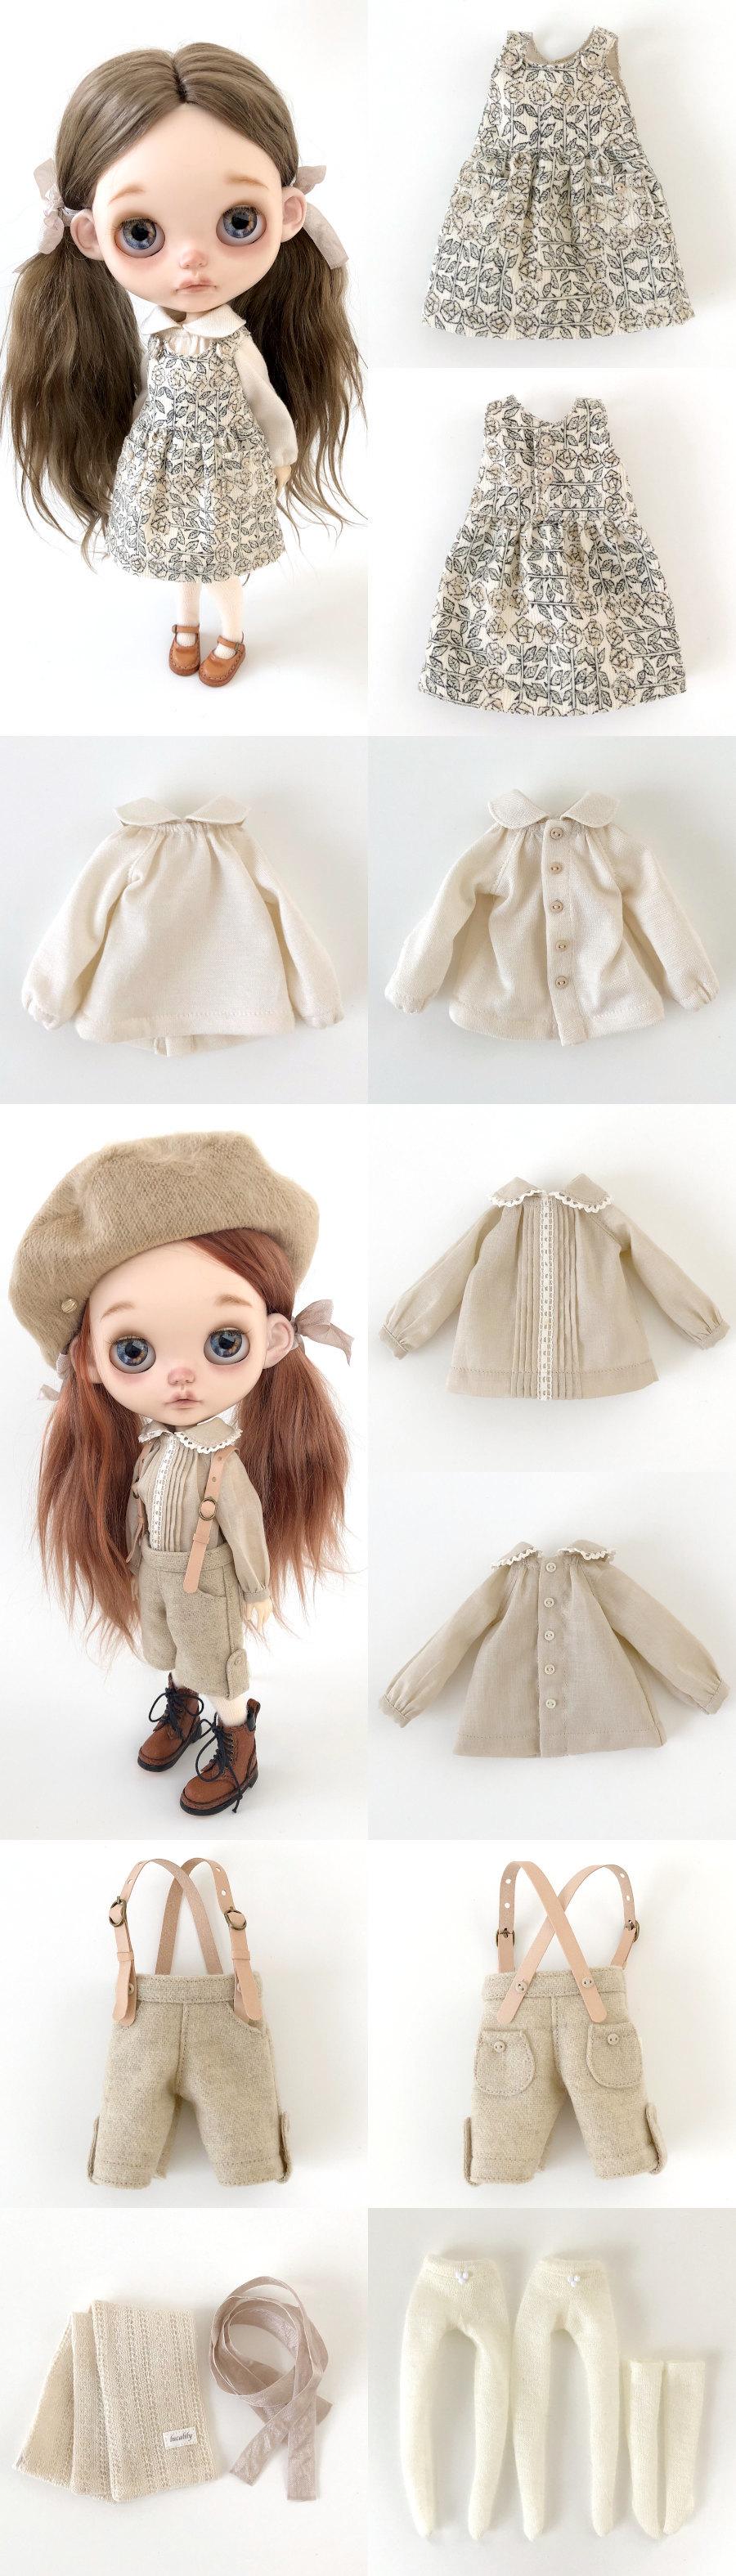 *lucalily * dolls clothes* Beige Duffle Coat Set *_d0217189_22180796.jpeg